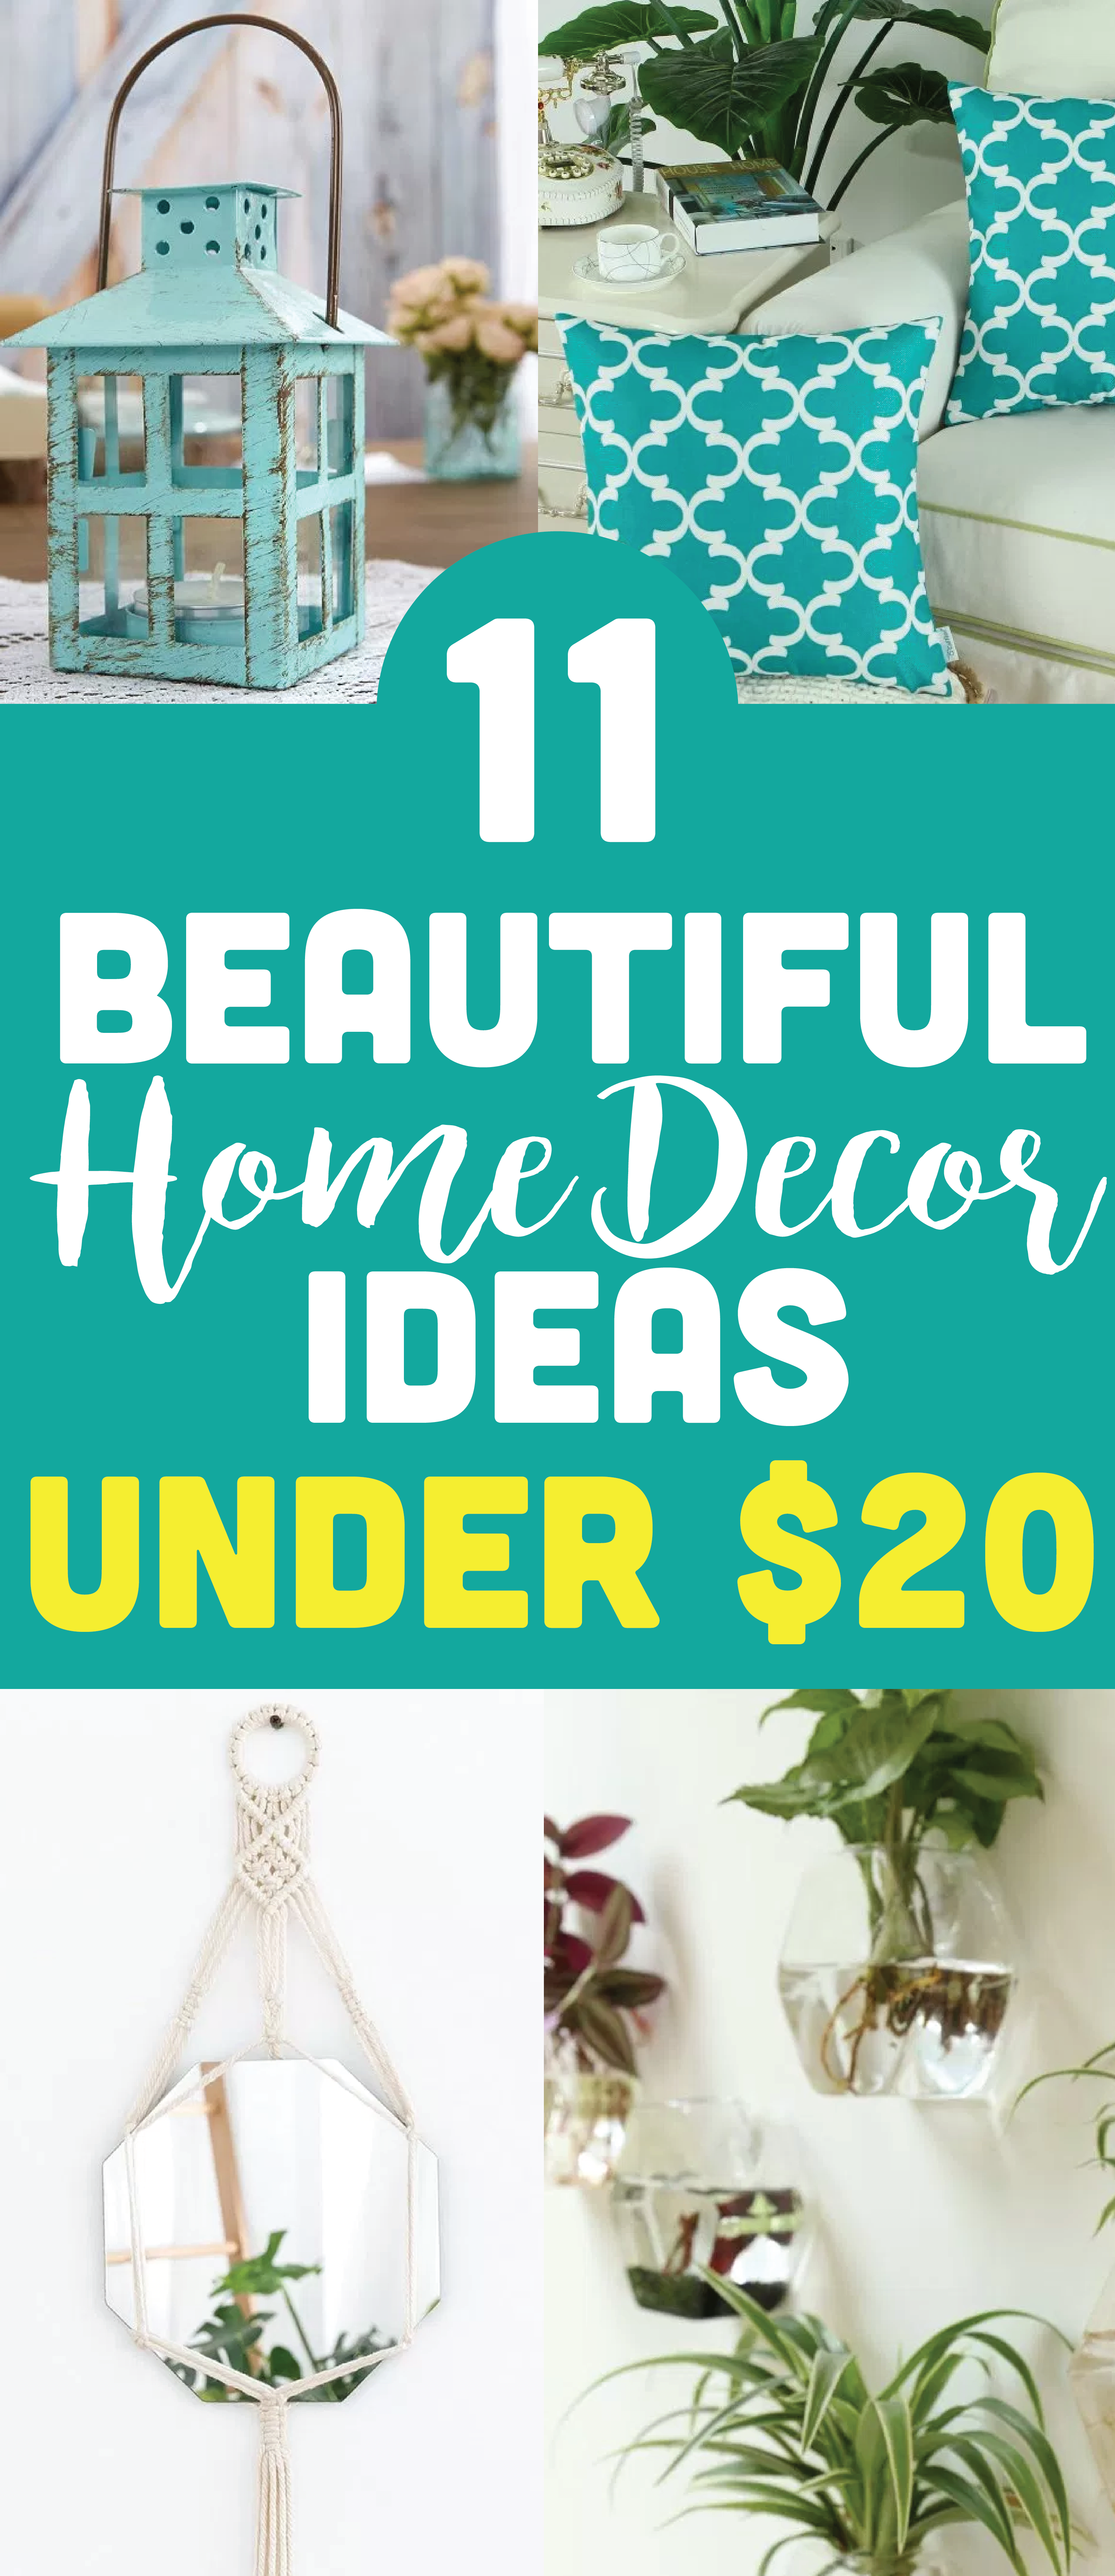 11 Amazon Home Decor Ideas For Under 20 Bucks Amazon Home Decor Home Decor Amazon Home